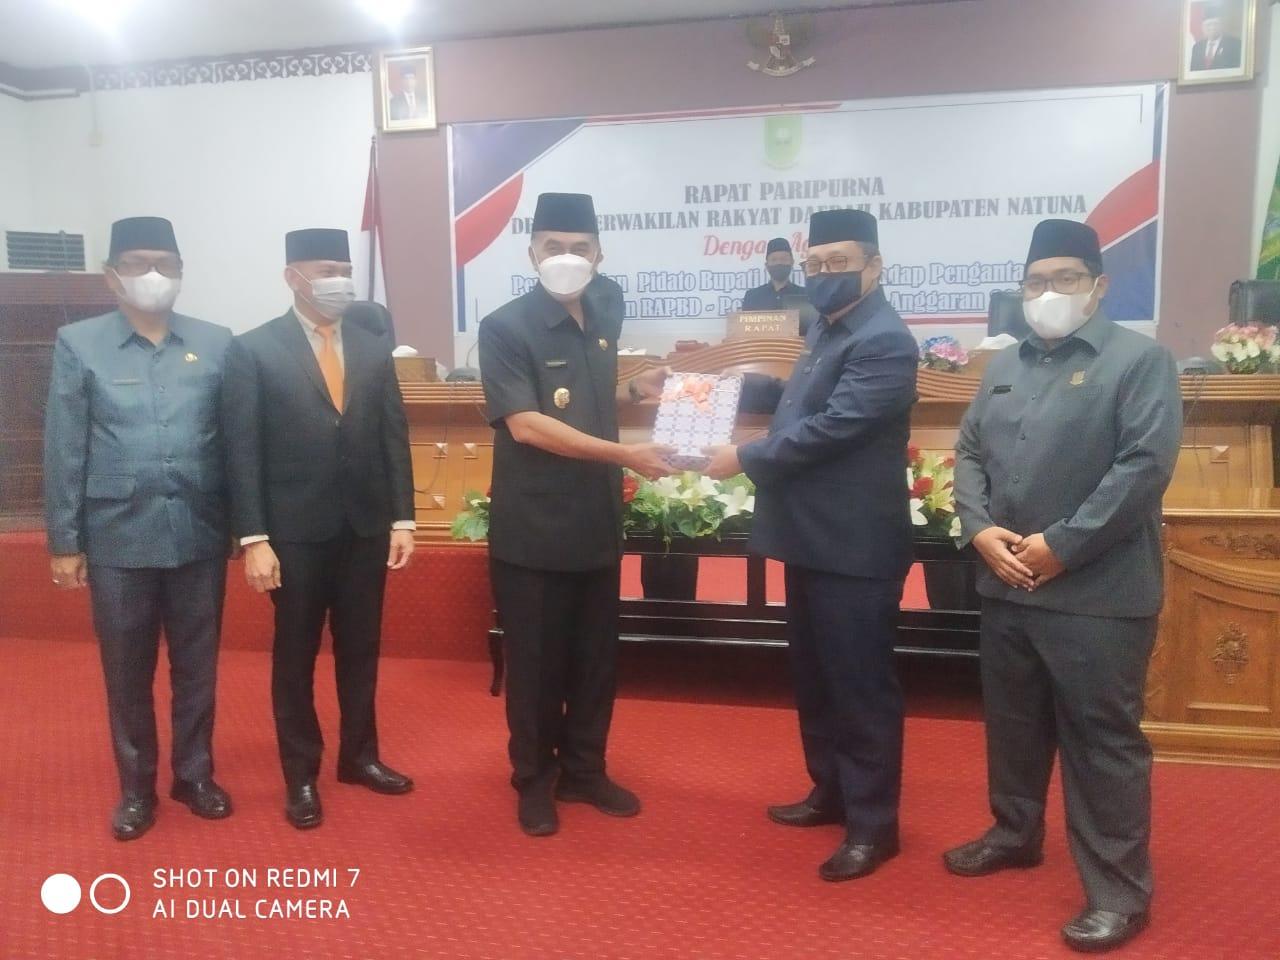 Bupati Sampaikan RAPBD-P Kabupaten Natuna TA 2021 kepada DPRD Kabupaten Natuna